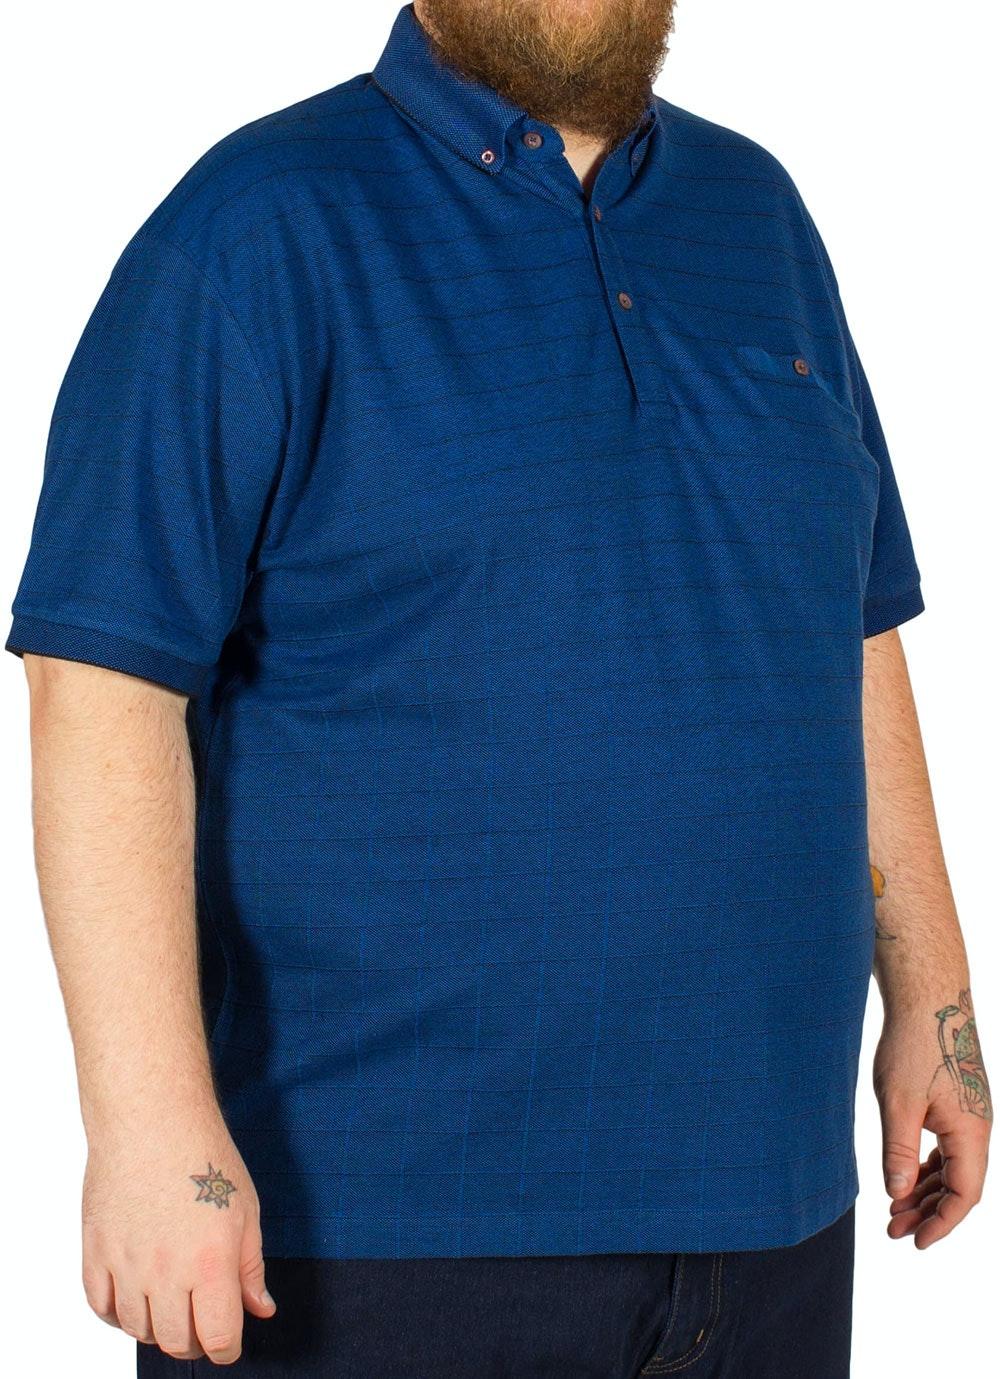 Lizard King Square Print Polo Shirt Cobalt